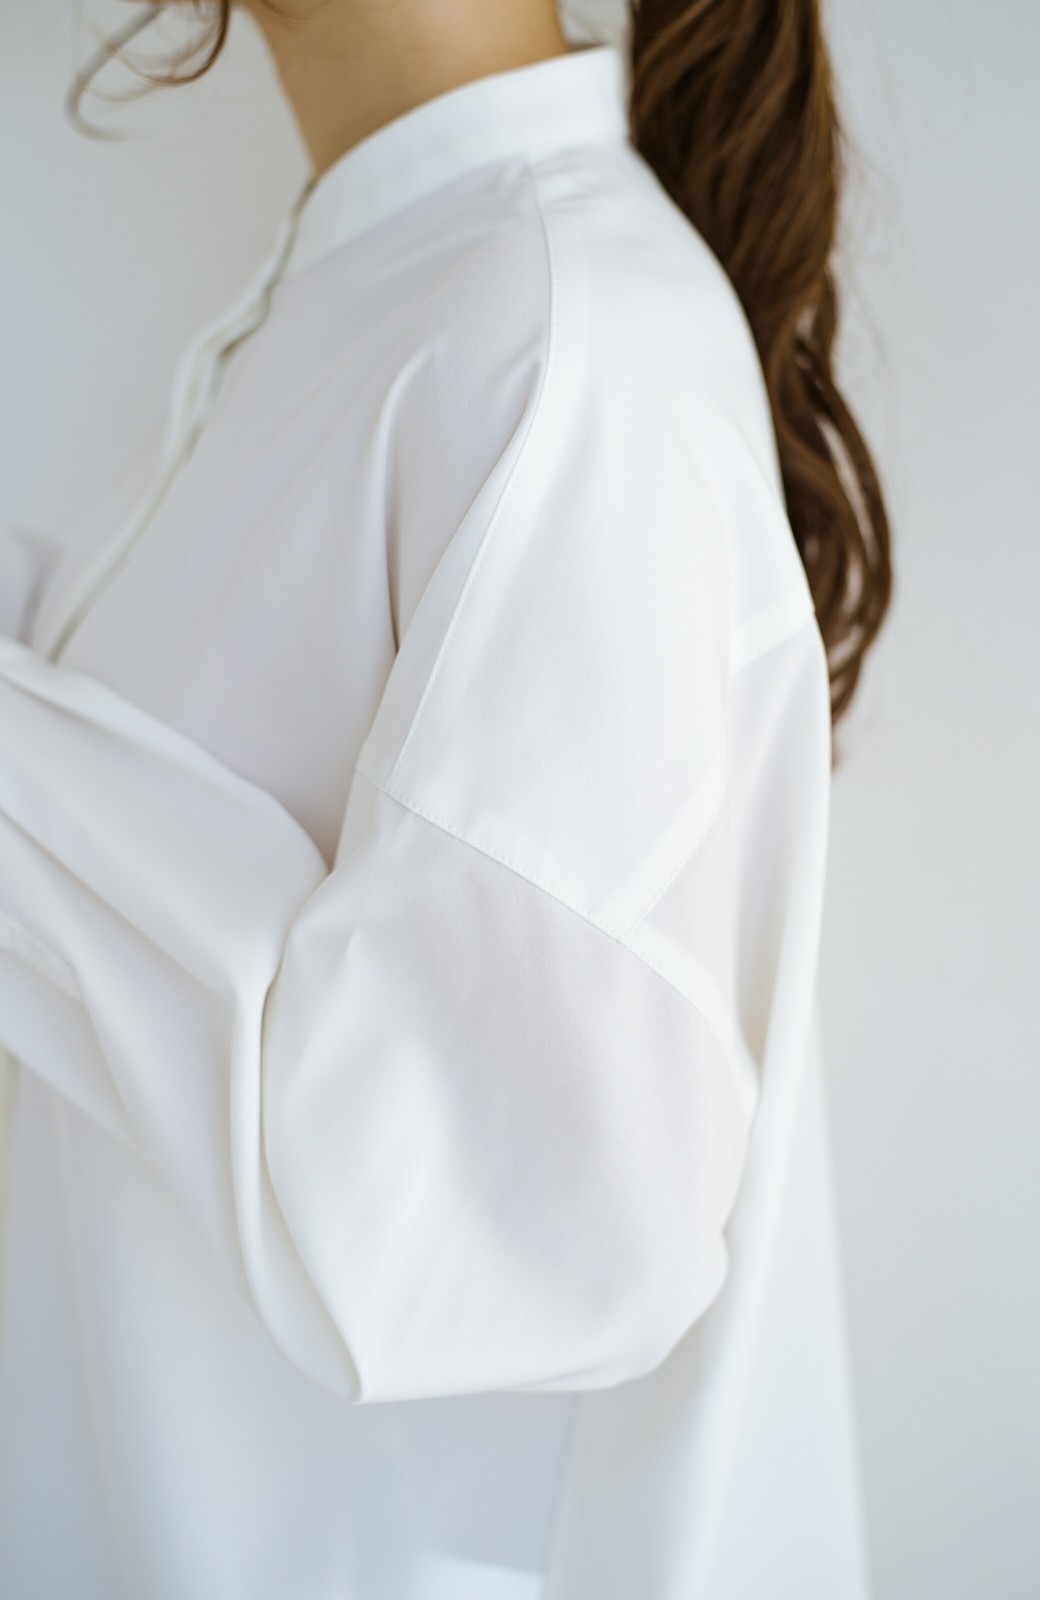 haco! 【肩幅党】肩幅広めがなんのその!華奢見せをとことん追求した重ね着にも便利なスタンドカラーシャツ <ホワイト>の商品写真4